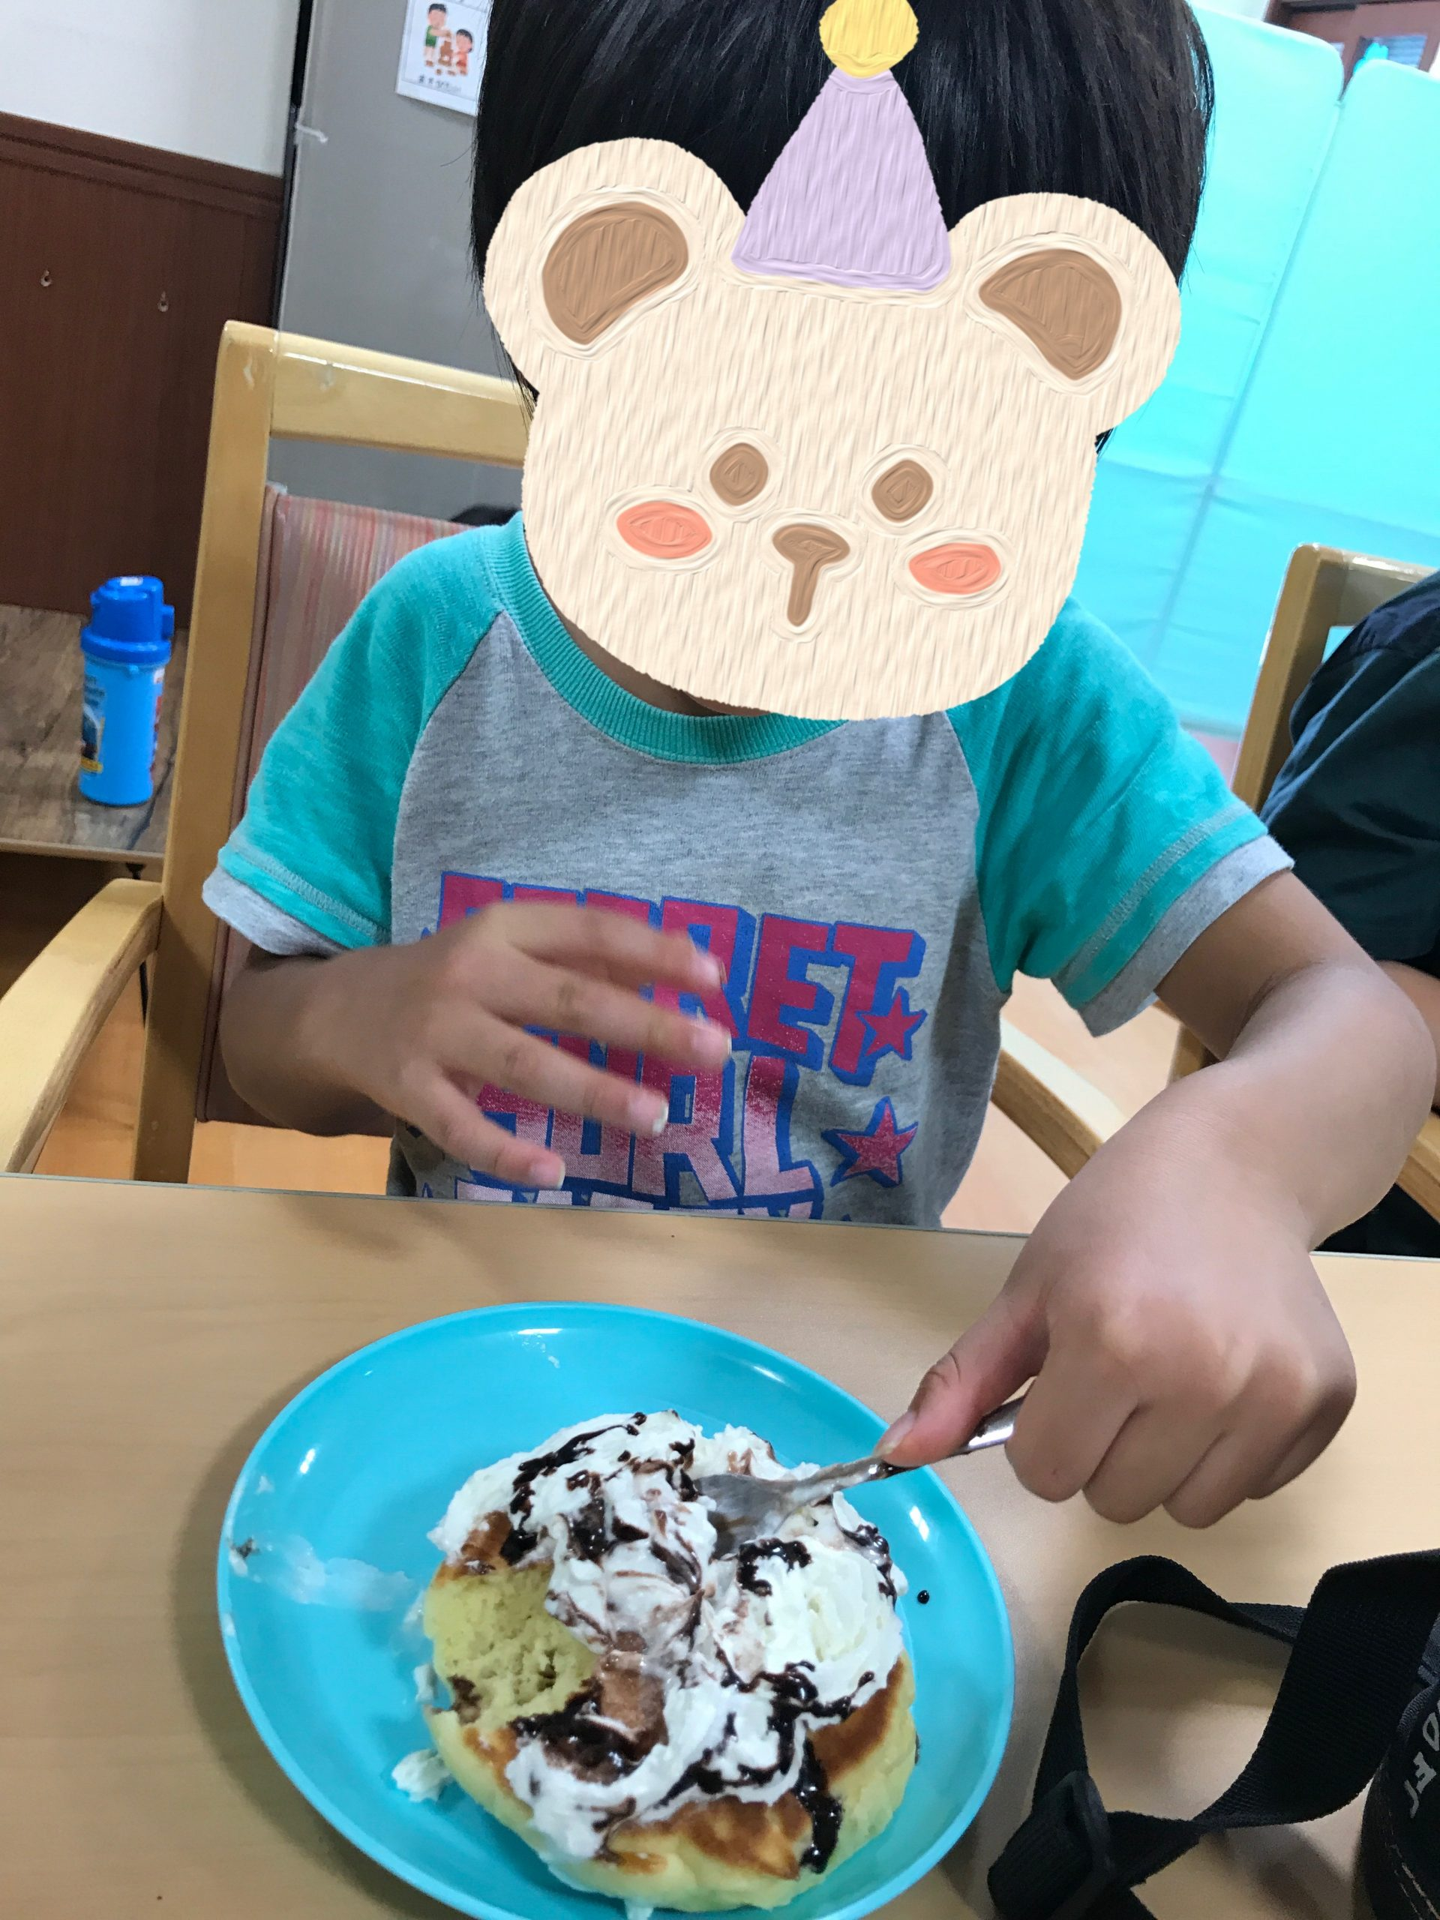 【Juno】山田池公園&ホットケーキ作り🥞